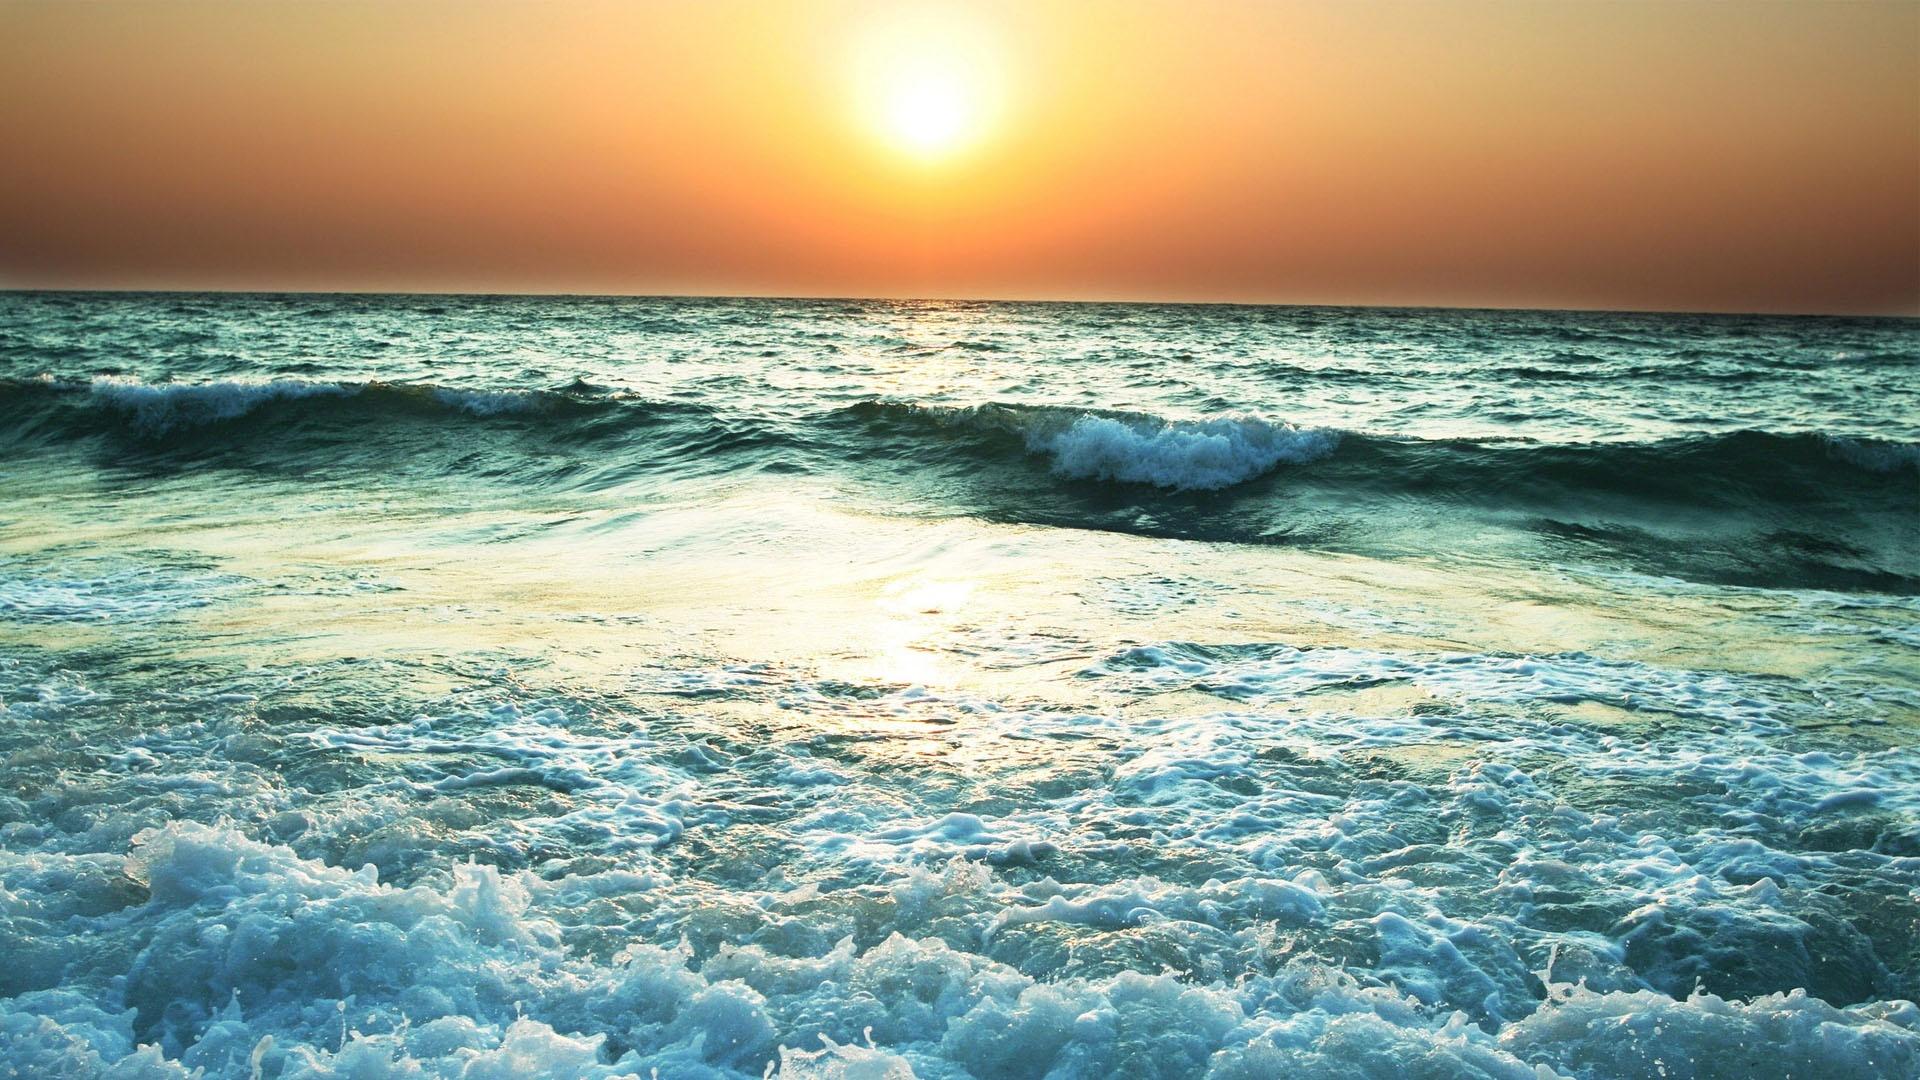 Immagini belle mare immagini belle for Immagini desktop mare